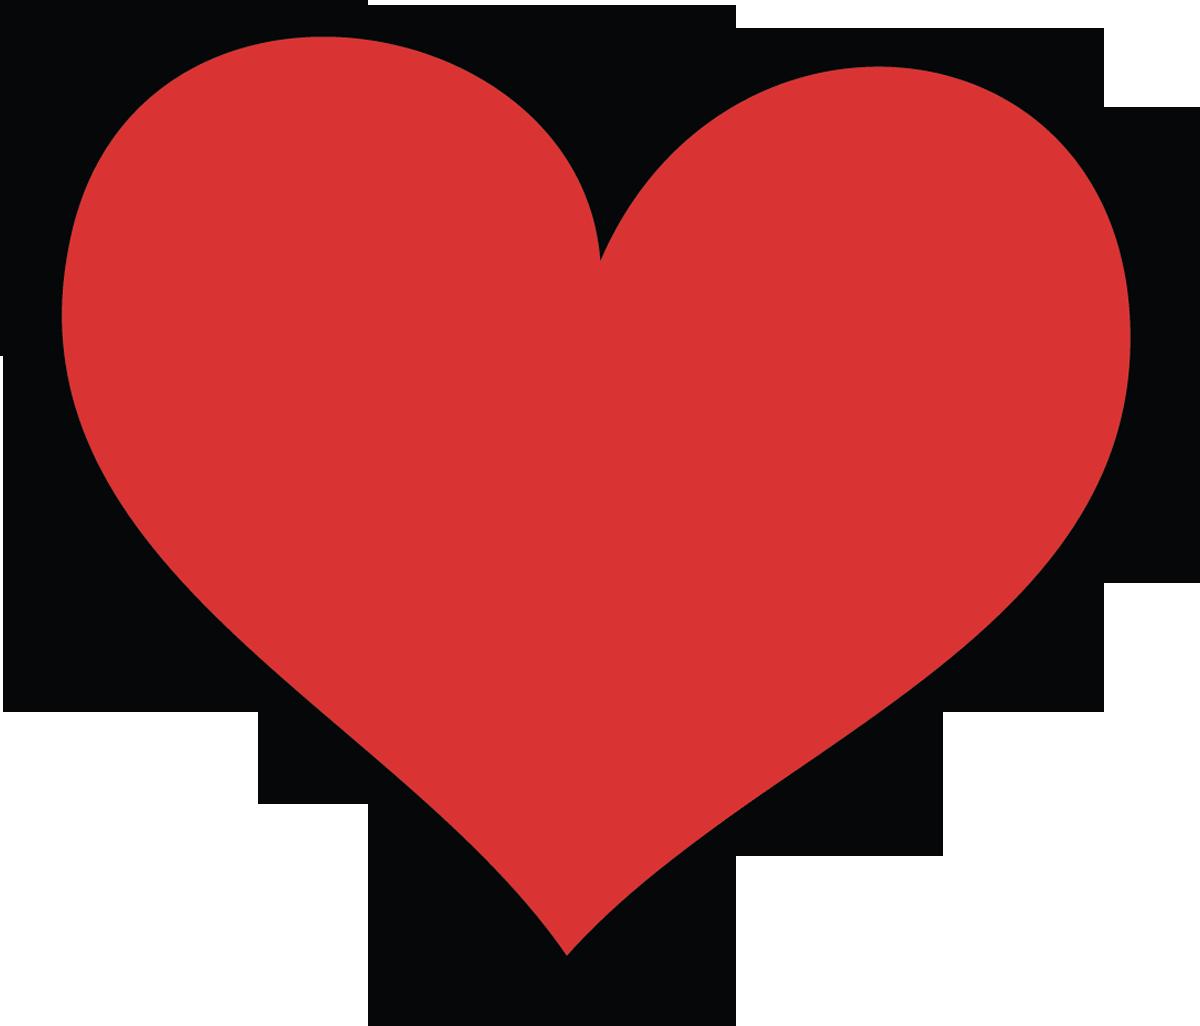 Love Hearts Clip Art 1